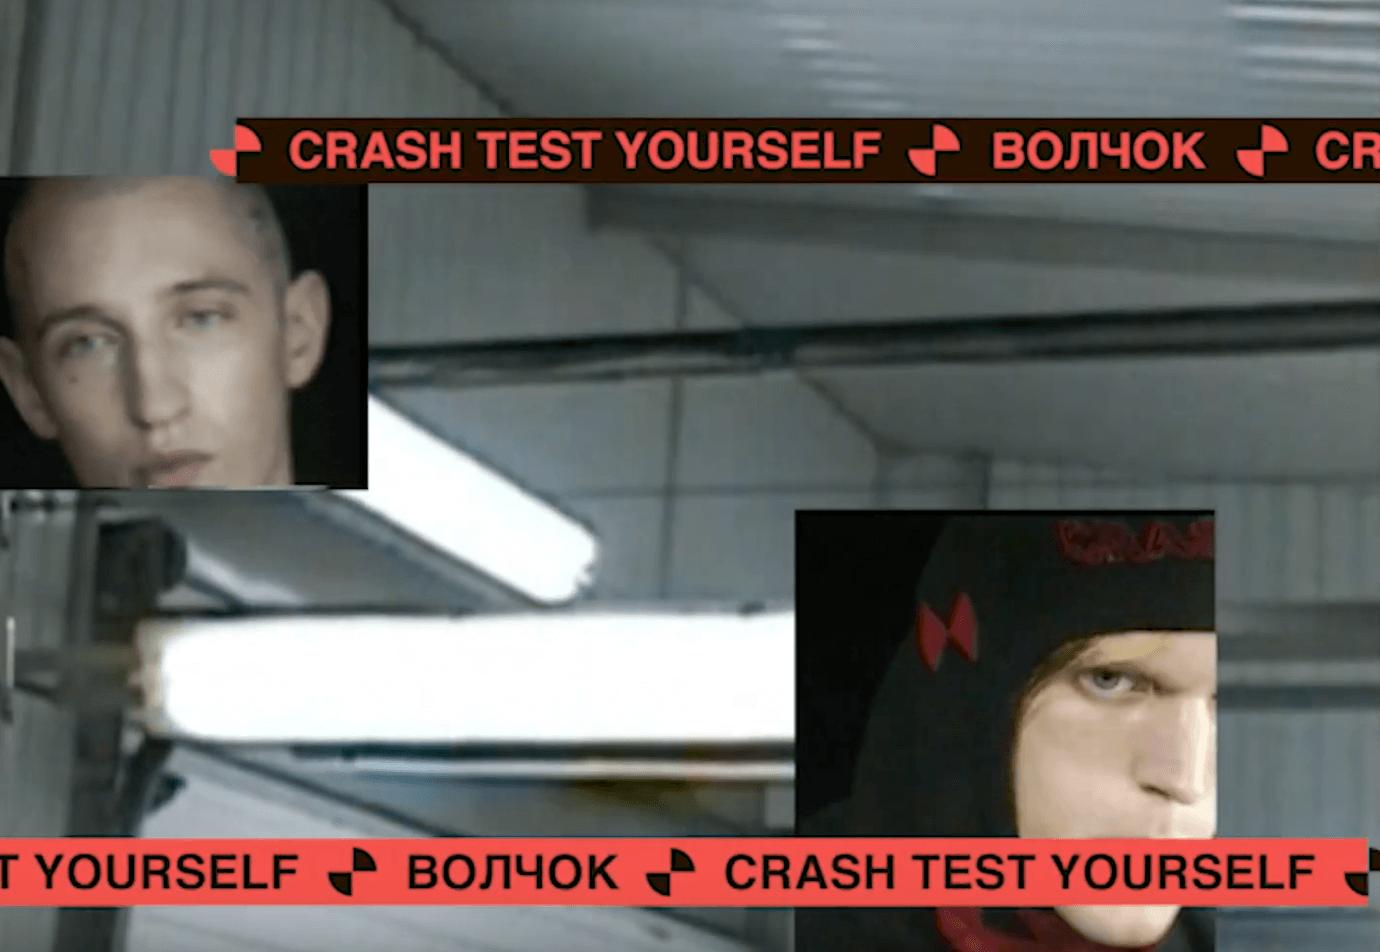 Volchok FW Crash Test